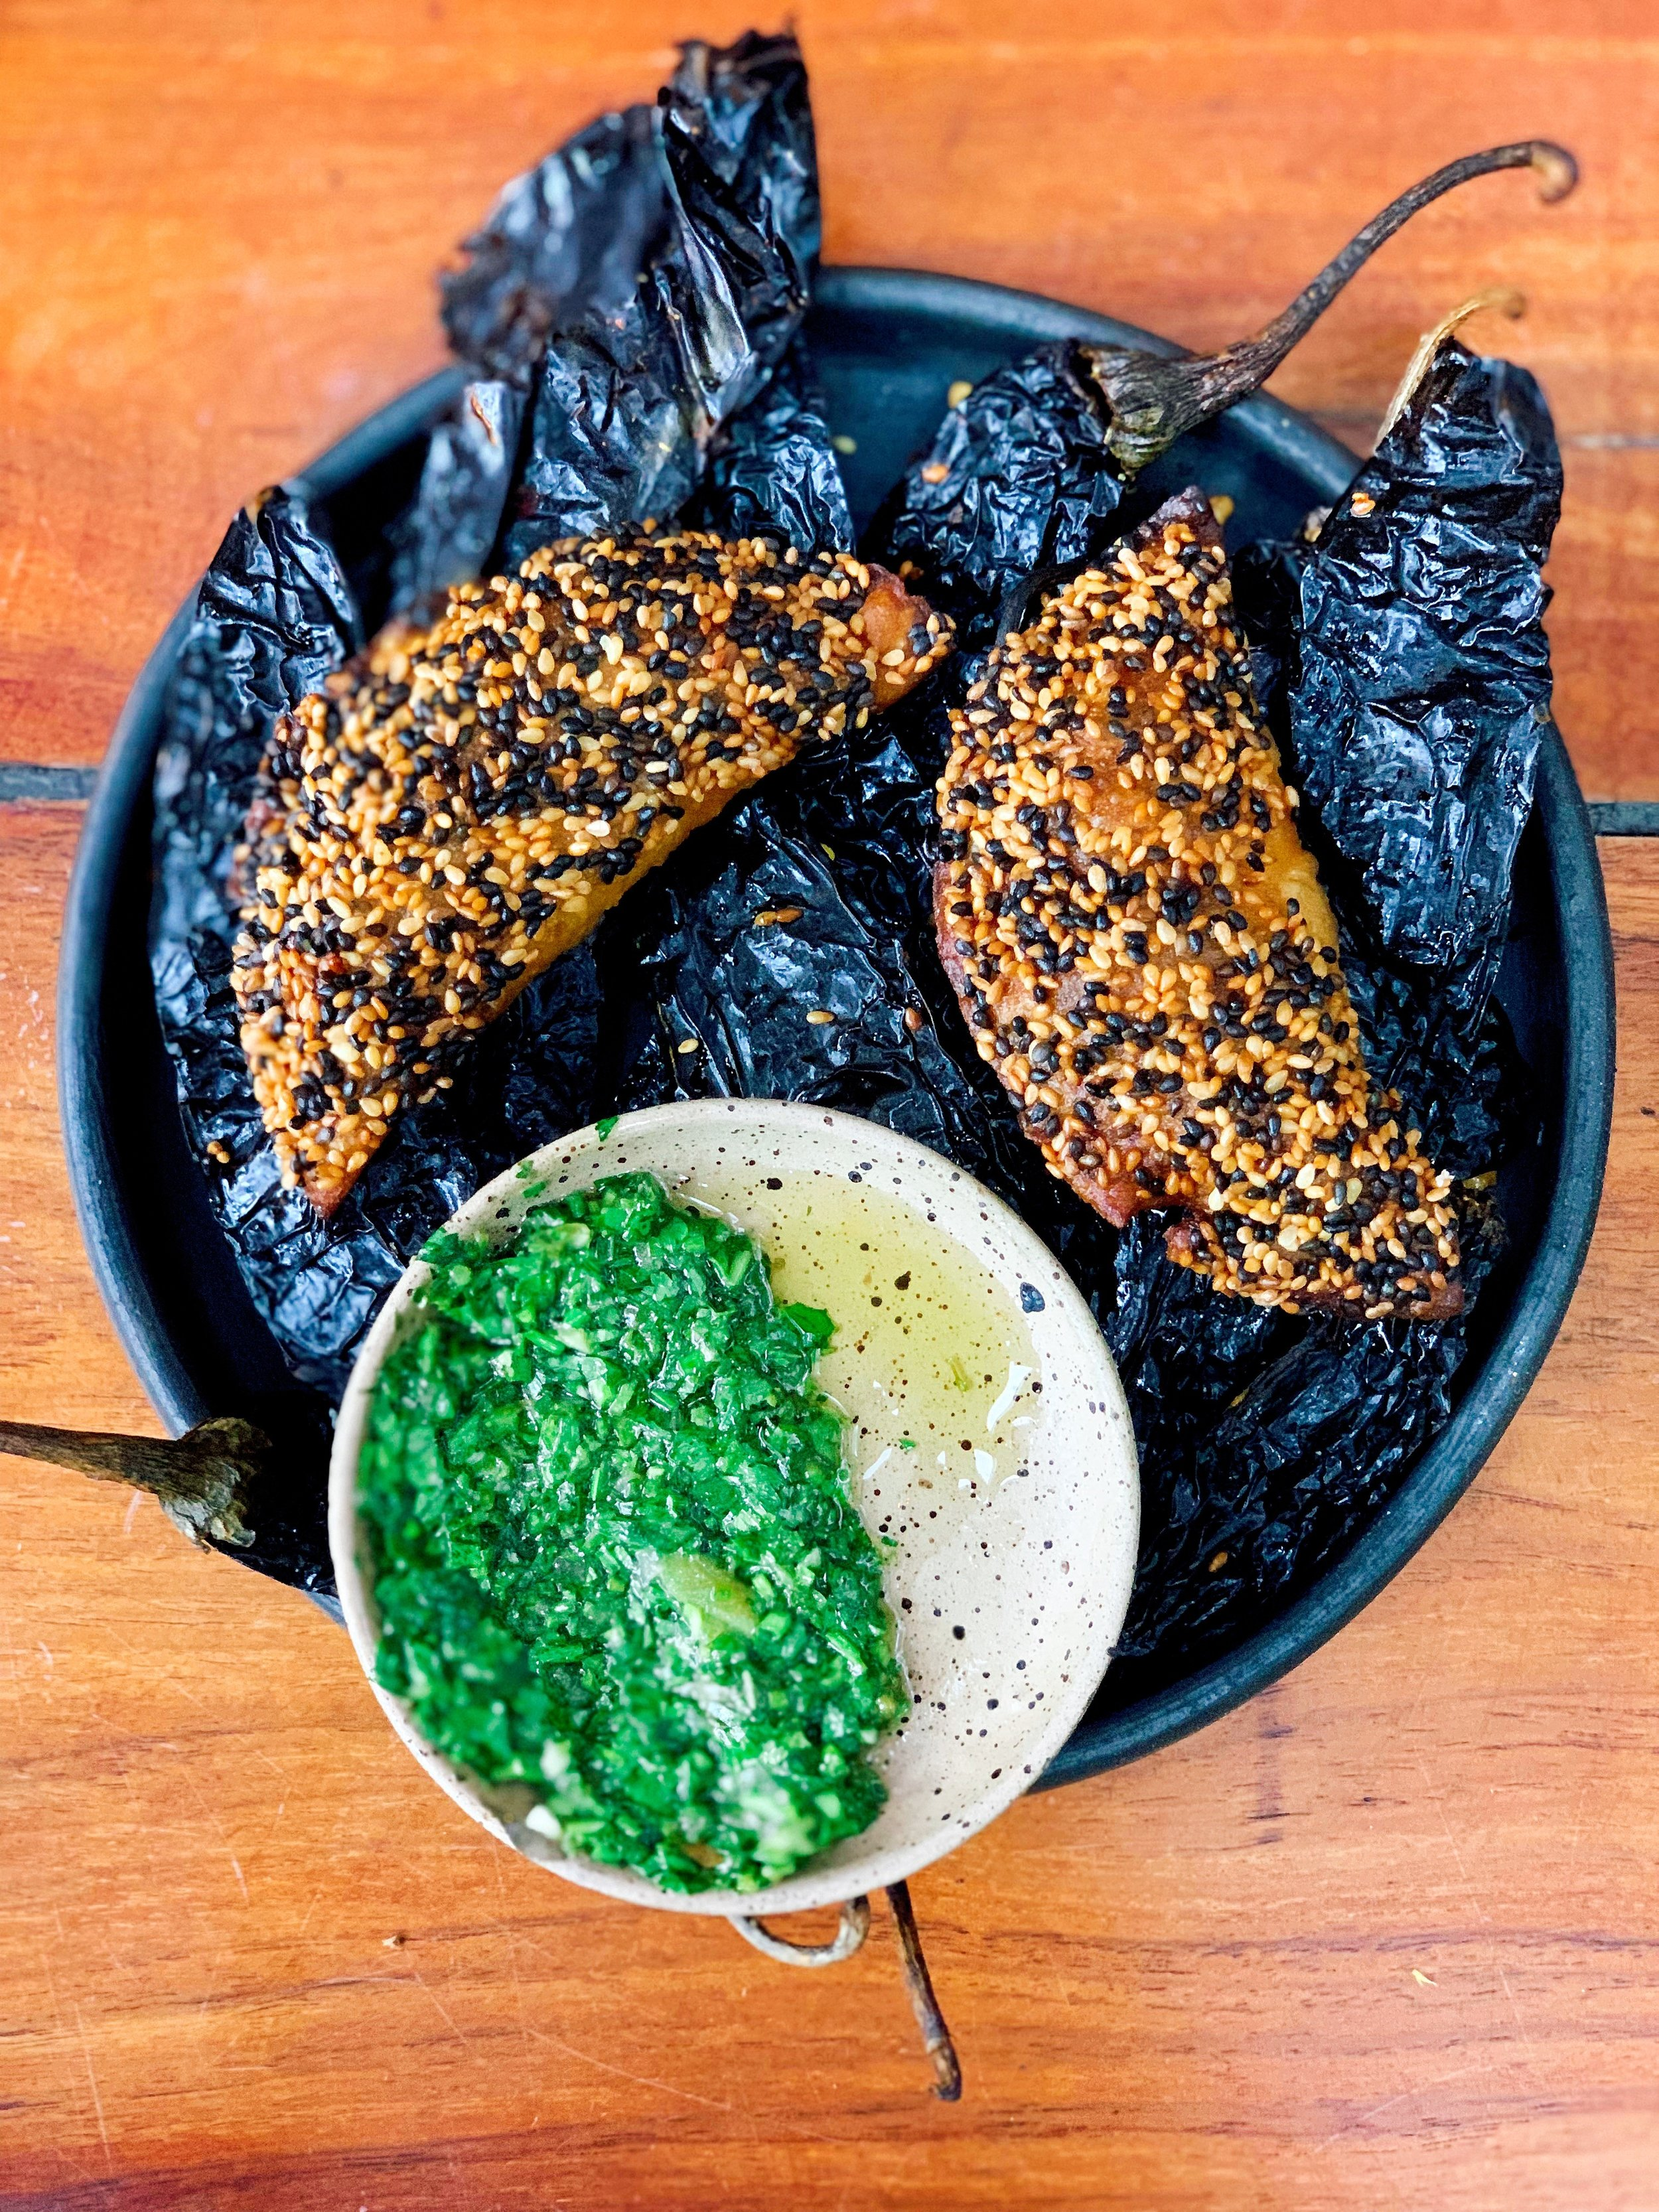 Roasted Local Empanadas + Grilled Oyster Mushrooms + Pinenut Mole + Oaxacan Cheese + Bechamel